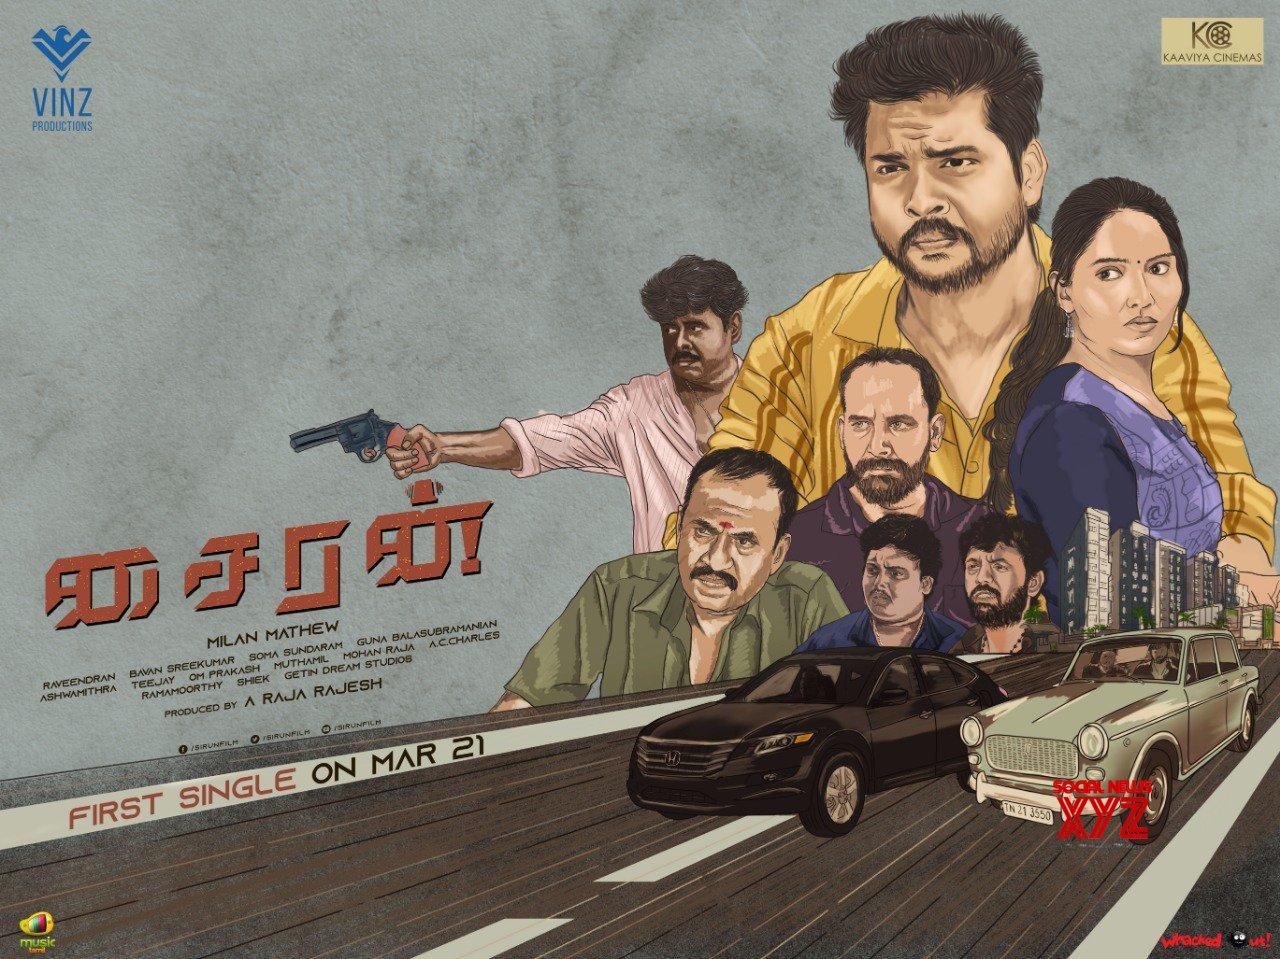 Milan Mathew's SIRUN Movie First Look Poster